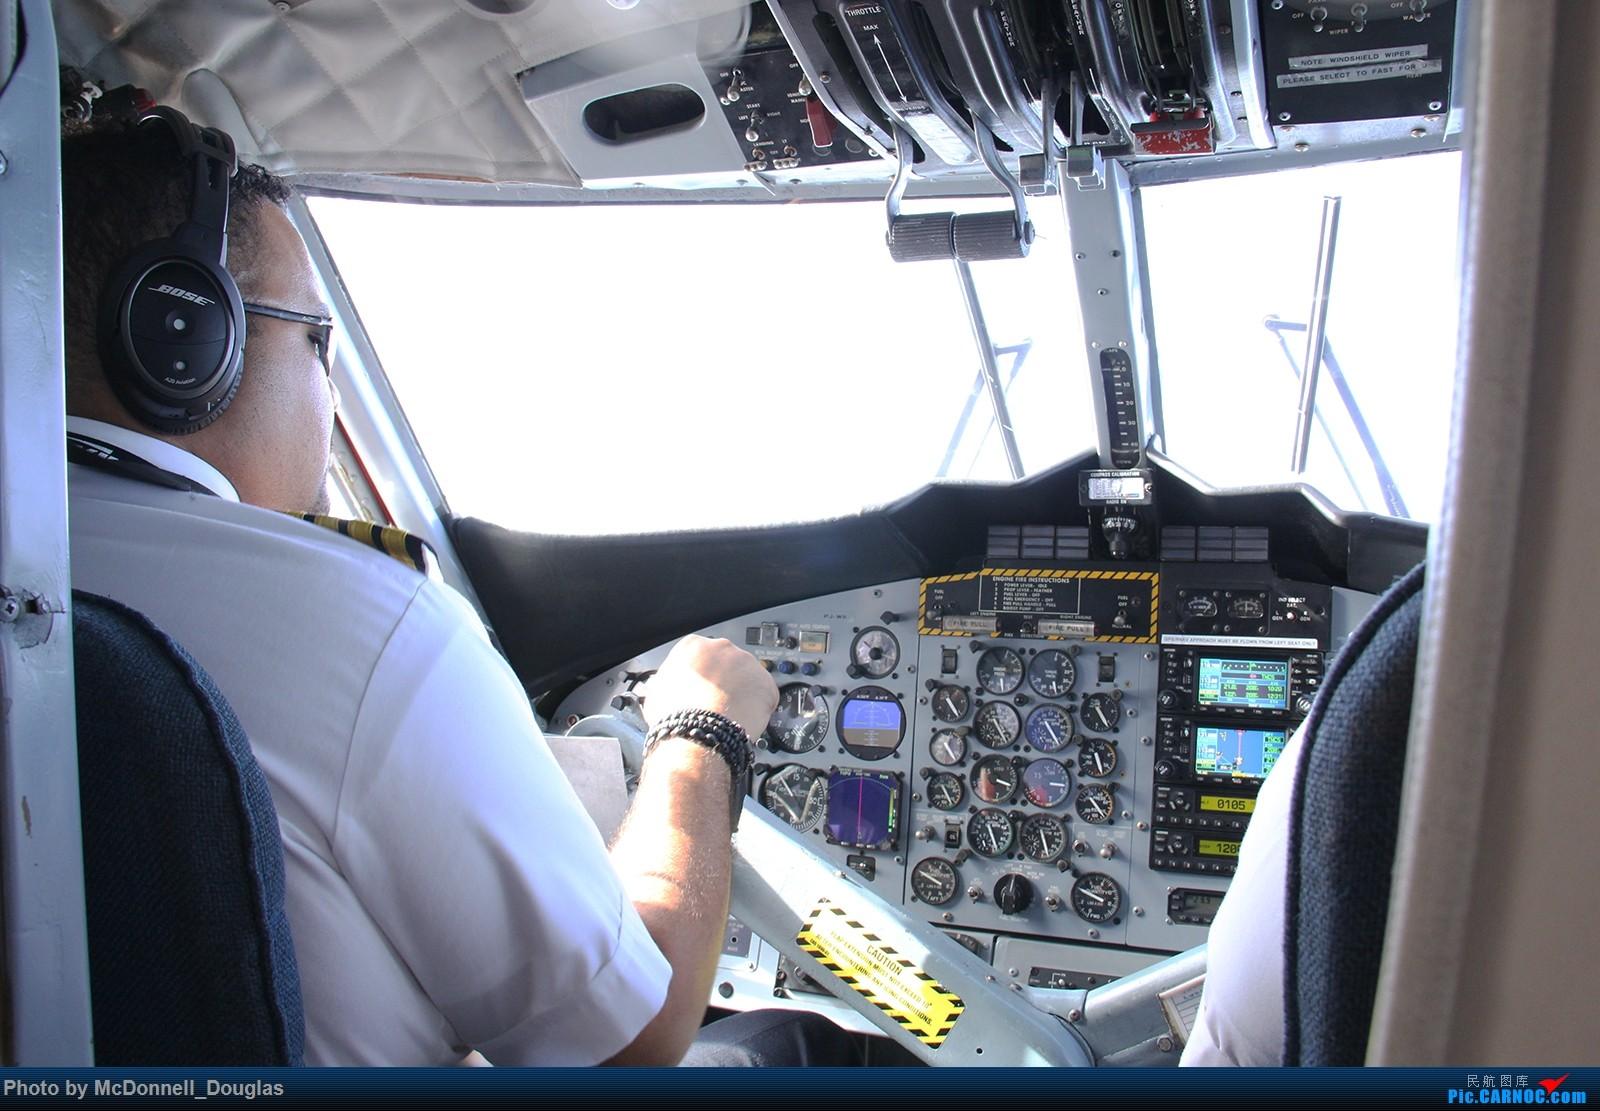 Re:[原创]【上海飞友会】图会很多,也有很多驾驶舱,杂七杂八的美帝,梦寐以求的圣马丁,这更绝不弃贴【驾驶舱已出现】【已更新至圣马丁部分】 DE HAVILLAND CANADA DHC-6-310 PJ-WII